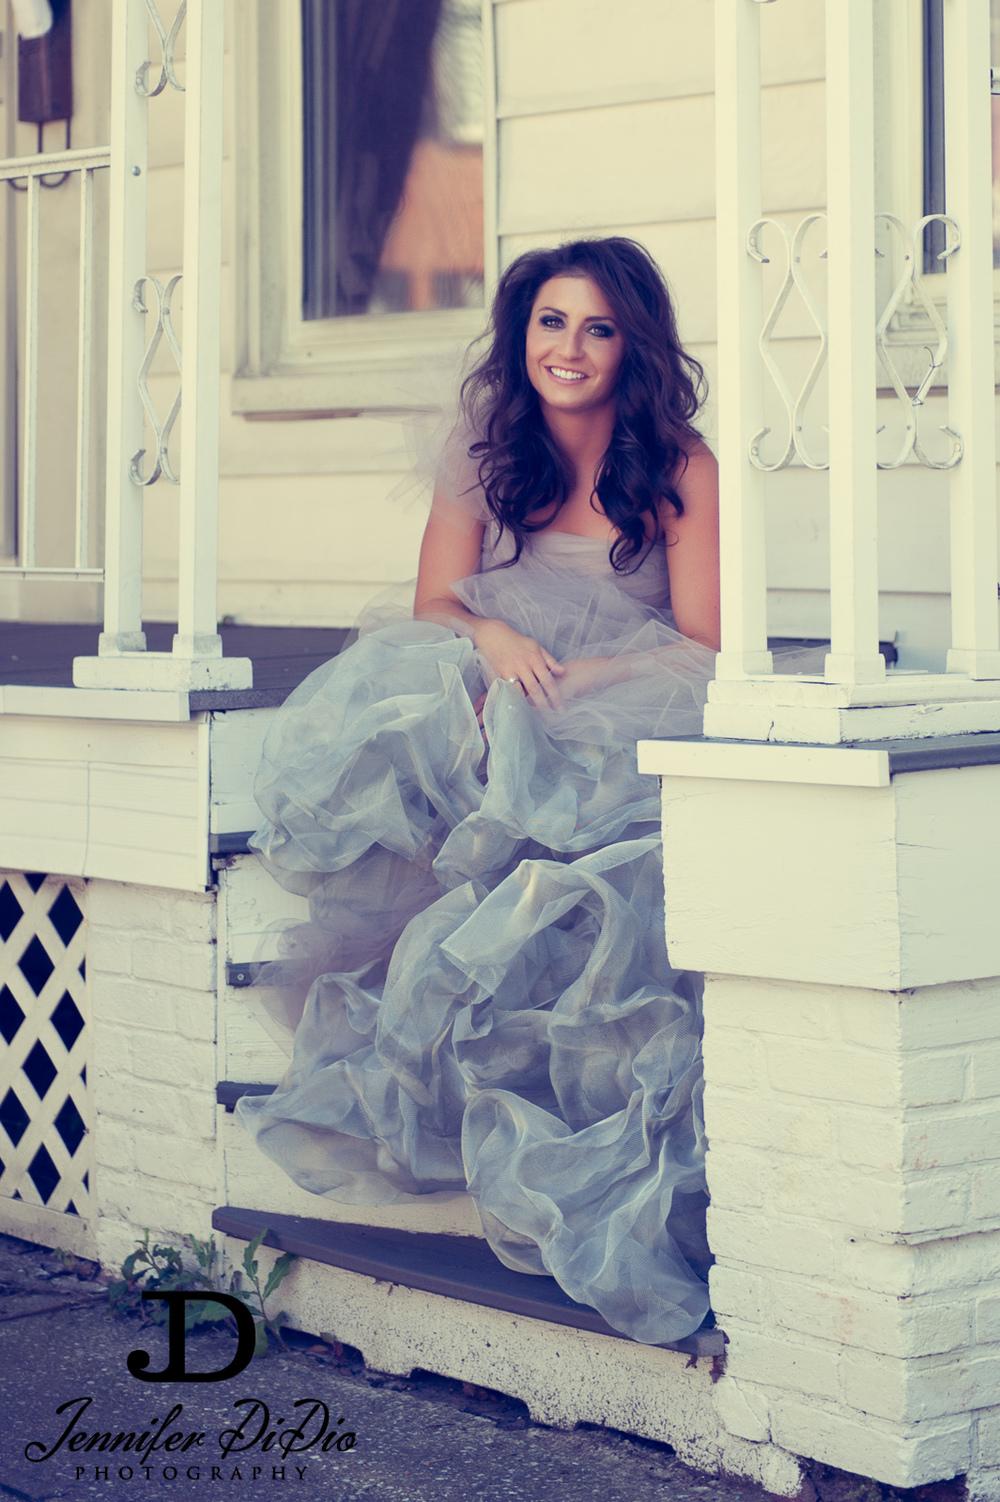 Jennifer.DiDio.Photography.Yagatich.Couture.Boudoir.2.2013-118-Edit.jpg